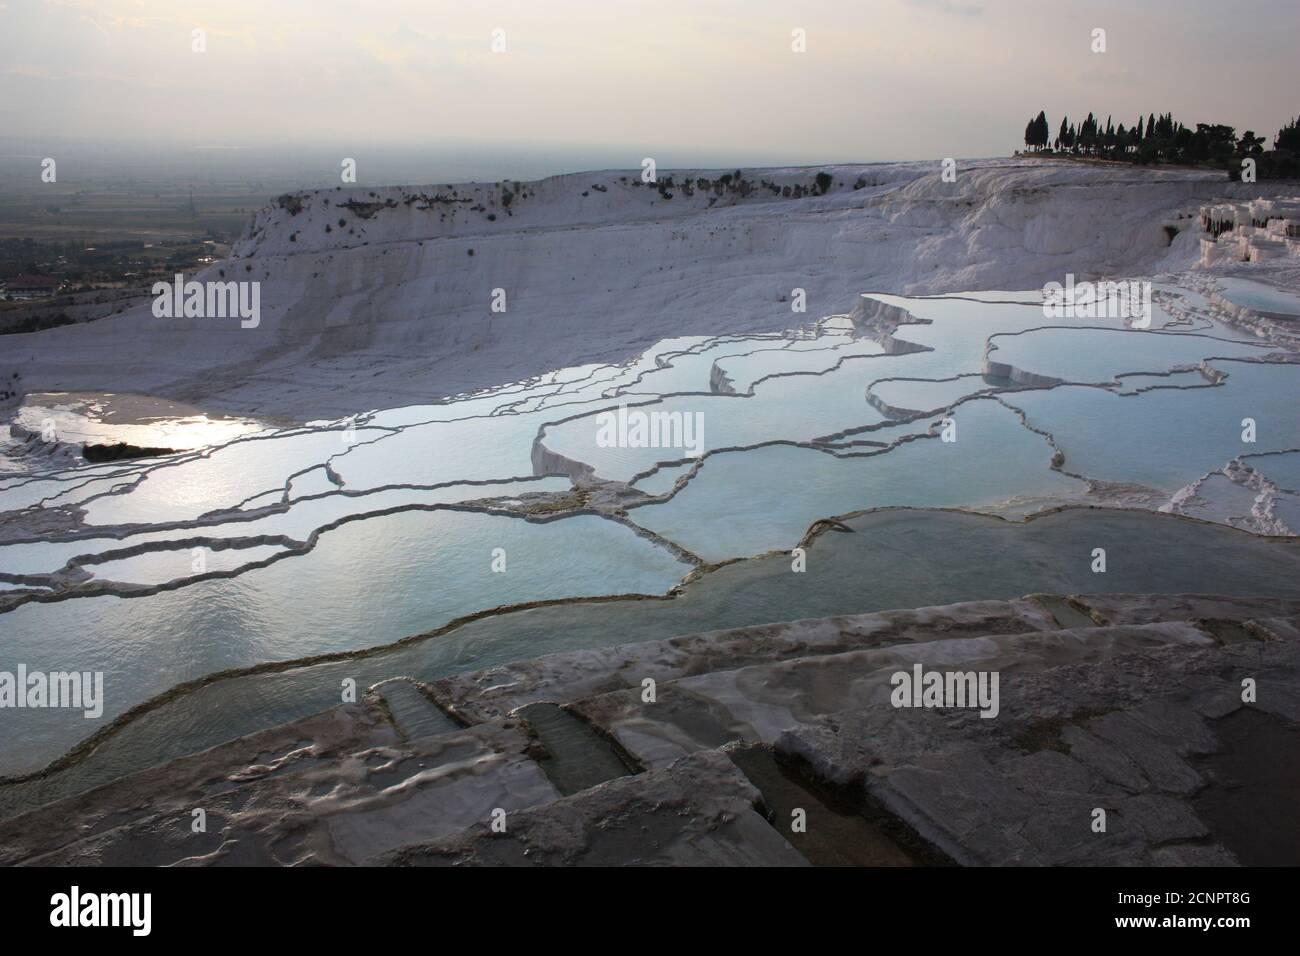 Pamukkale al atardecer, sinter terrazas Turquía Foto de stock